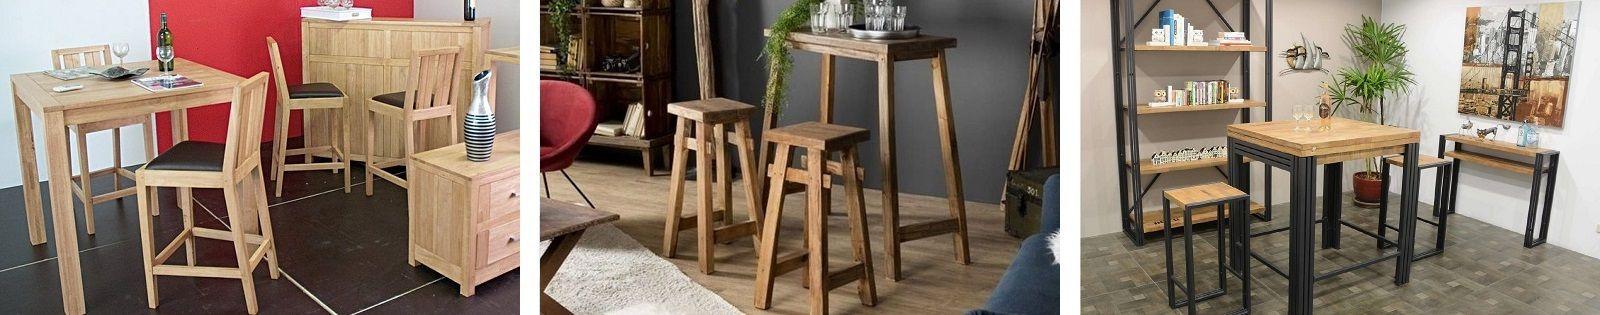 Table bar en bois massif : acacia, chêne, hévéa, teck, manguier et en bambou, rotin, fer forgé